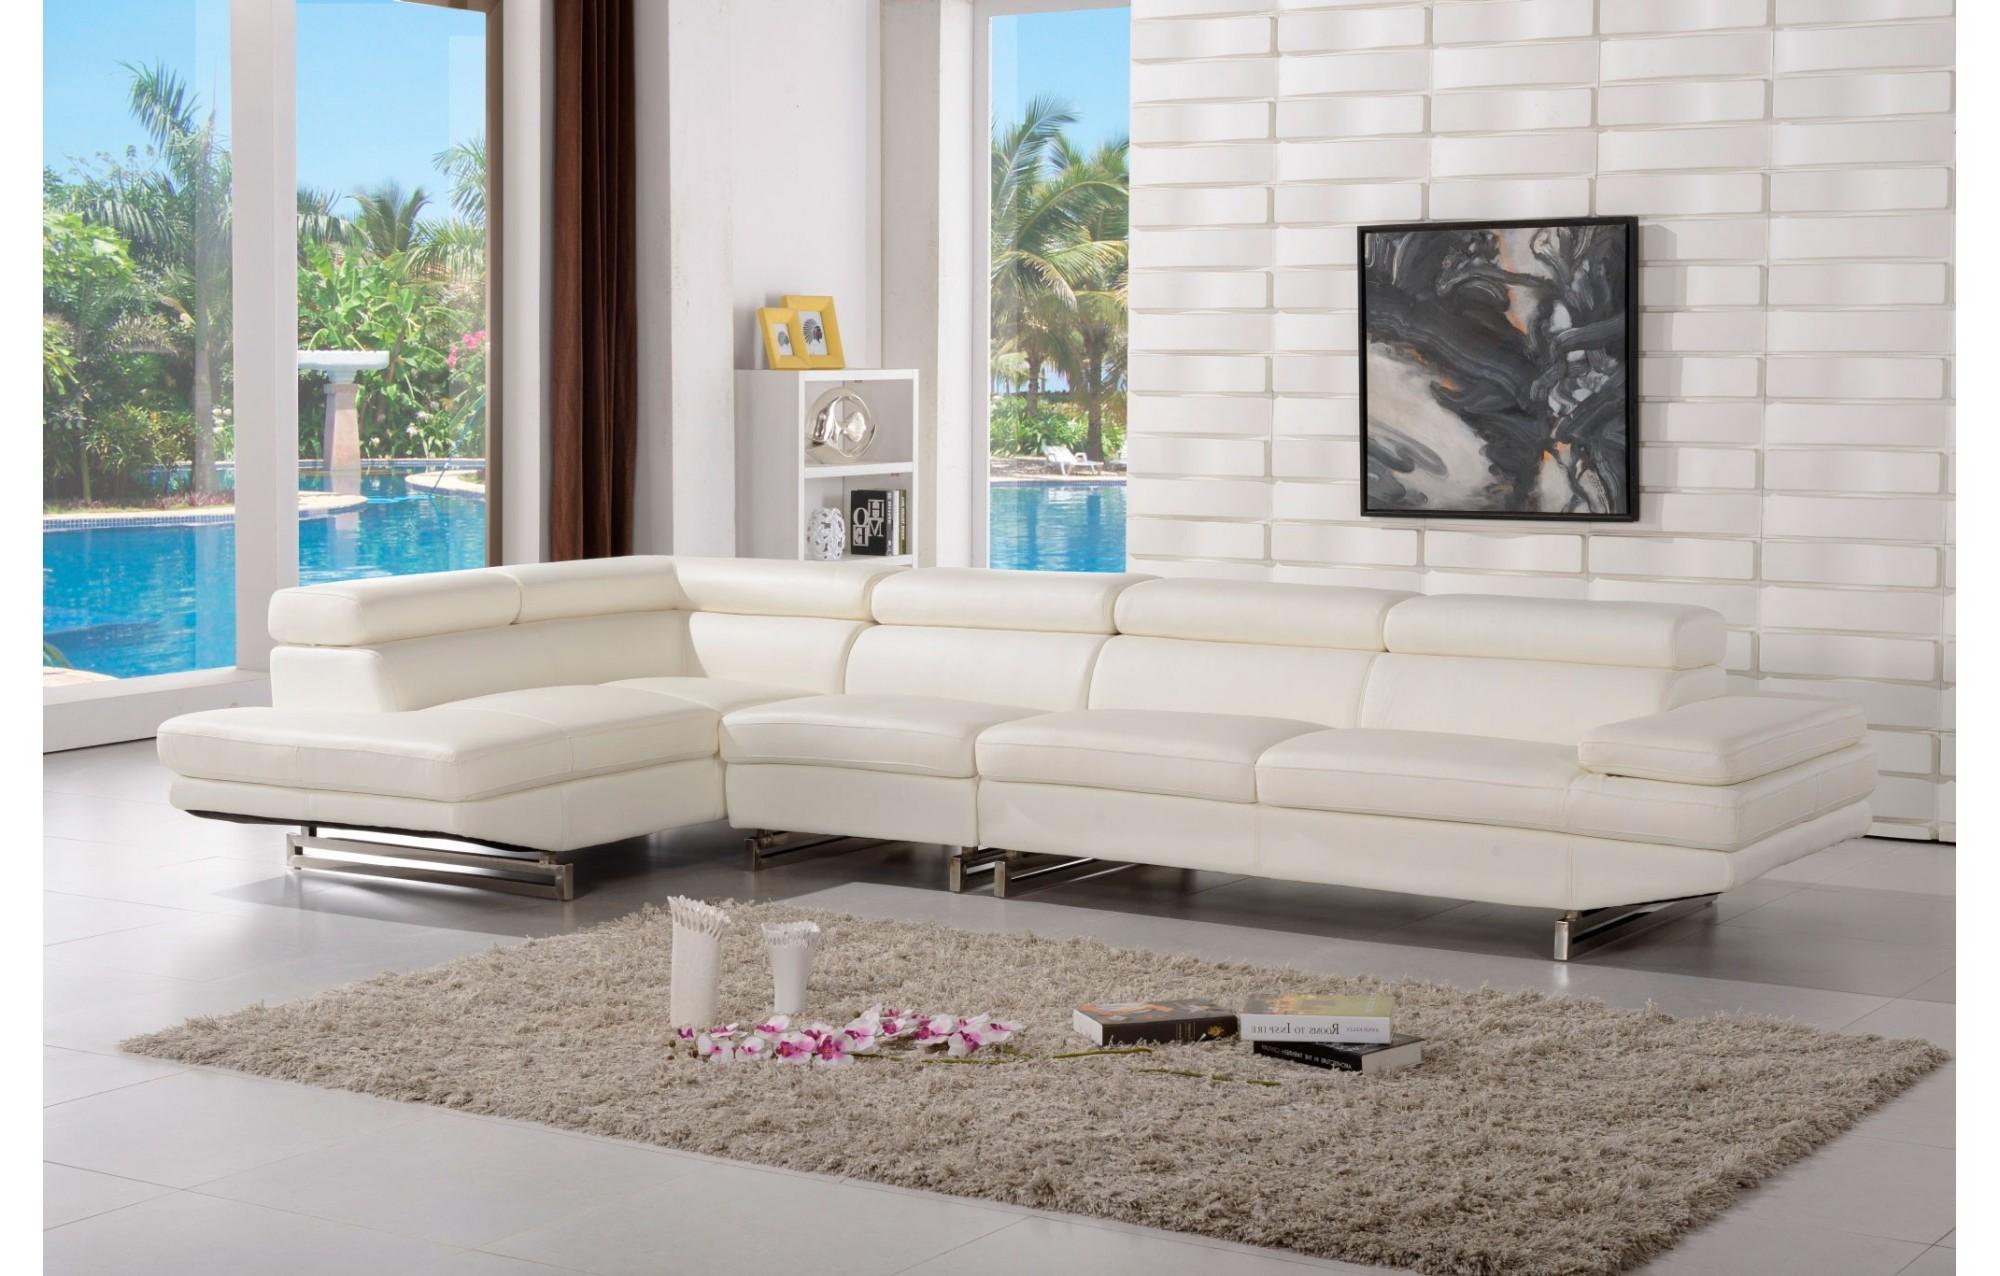 Canapé d'angle en cuir milano   4 places   méridienne   teck in home